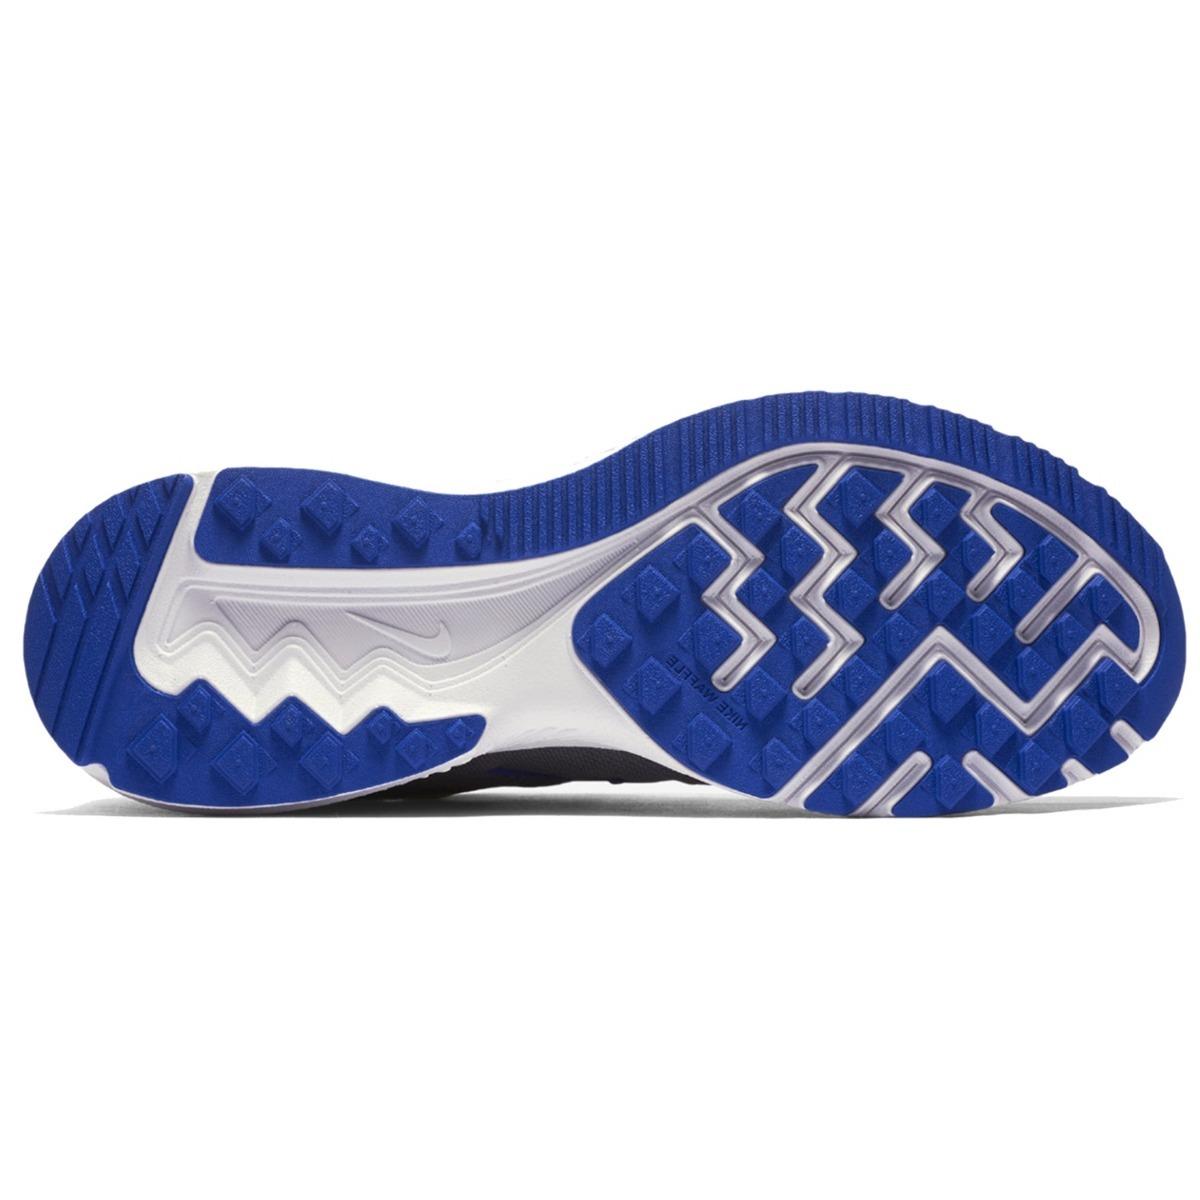 0bbeb7738e tenis nike zoom winflo 3 gris azul correr running